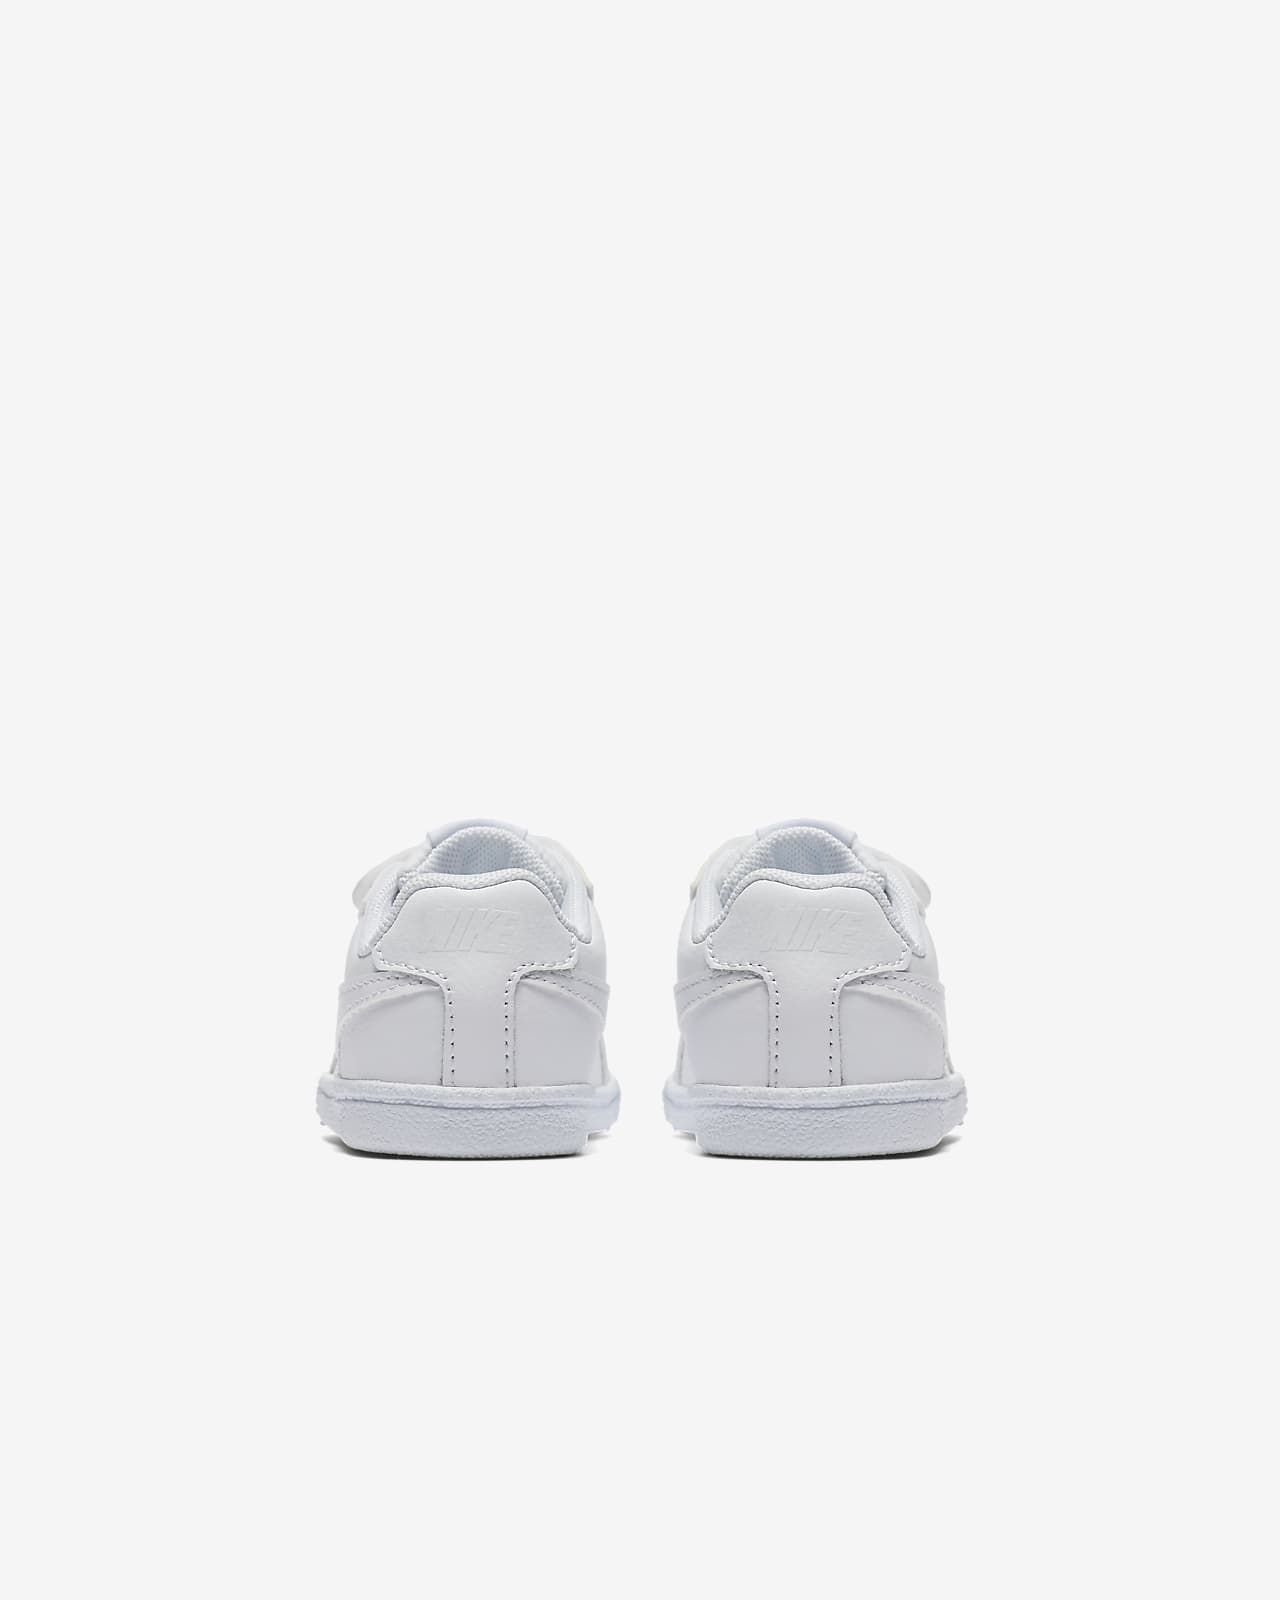 Nike Court Royale Baby/Toddler Shoe